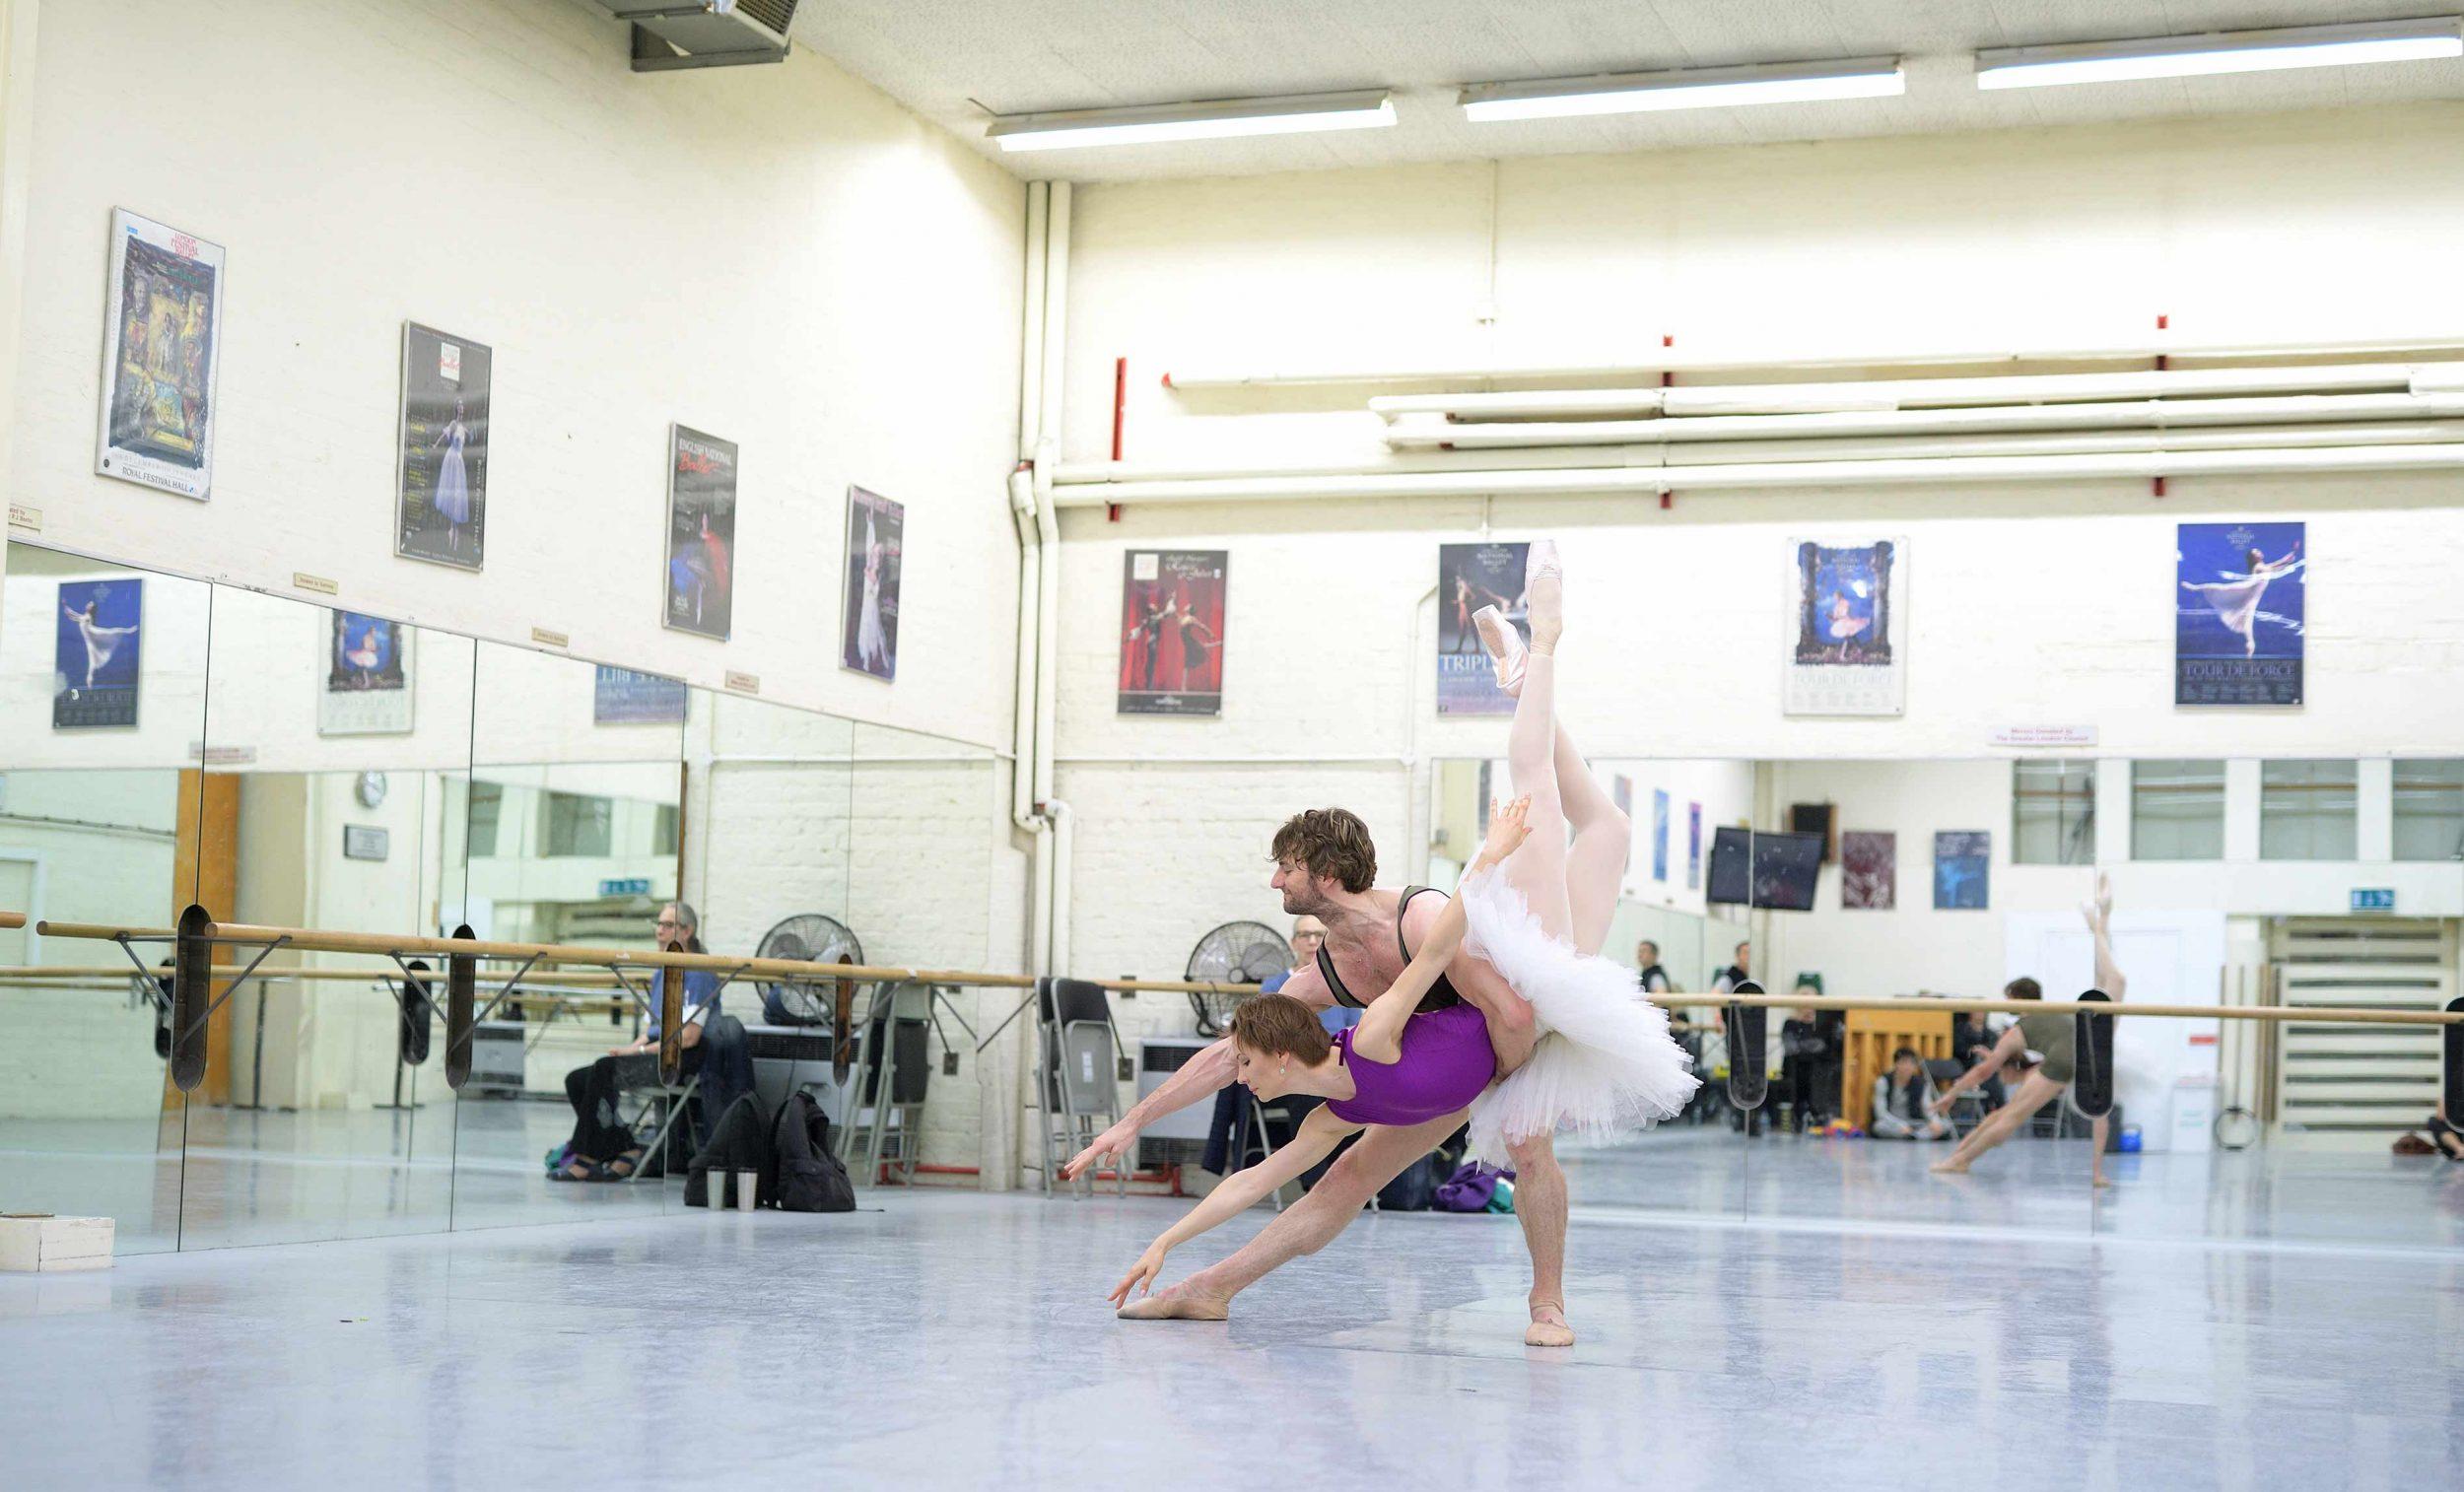 Maria-Alexandrova-and-Aaron-Robison-rehearsing-The-Sleeping-Beauty-©-Laurent-Liotardo-(3)